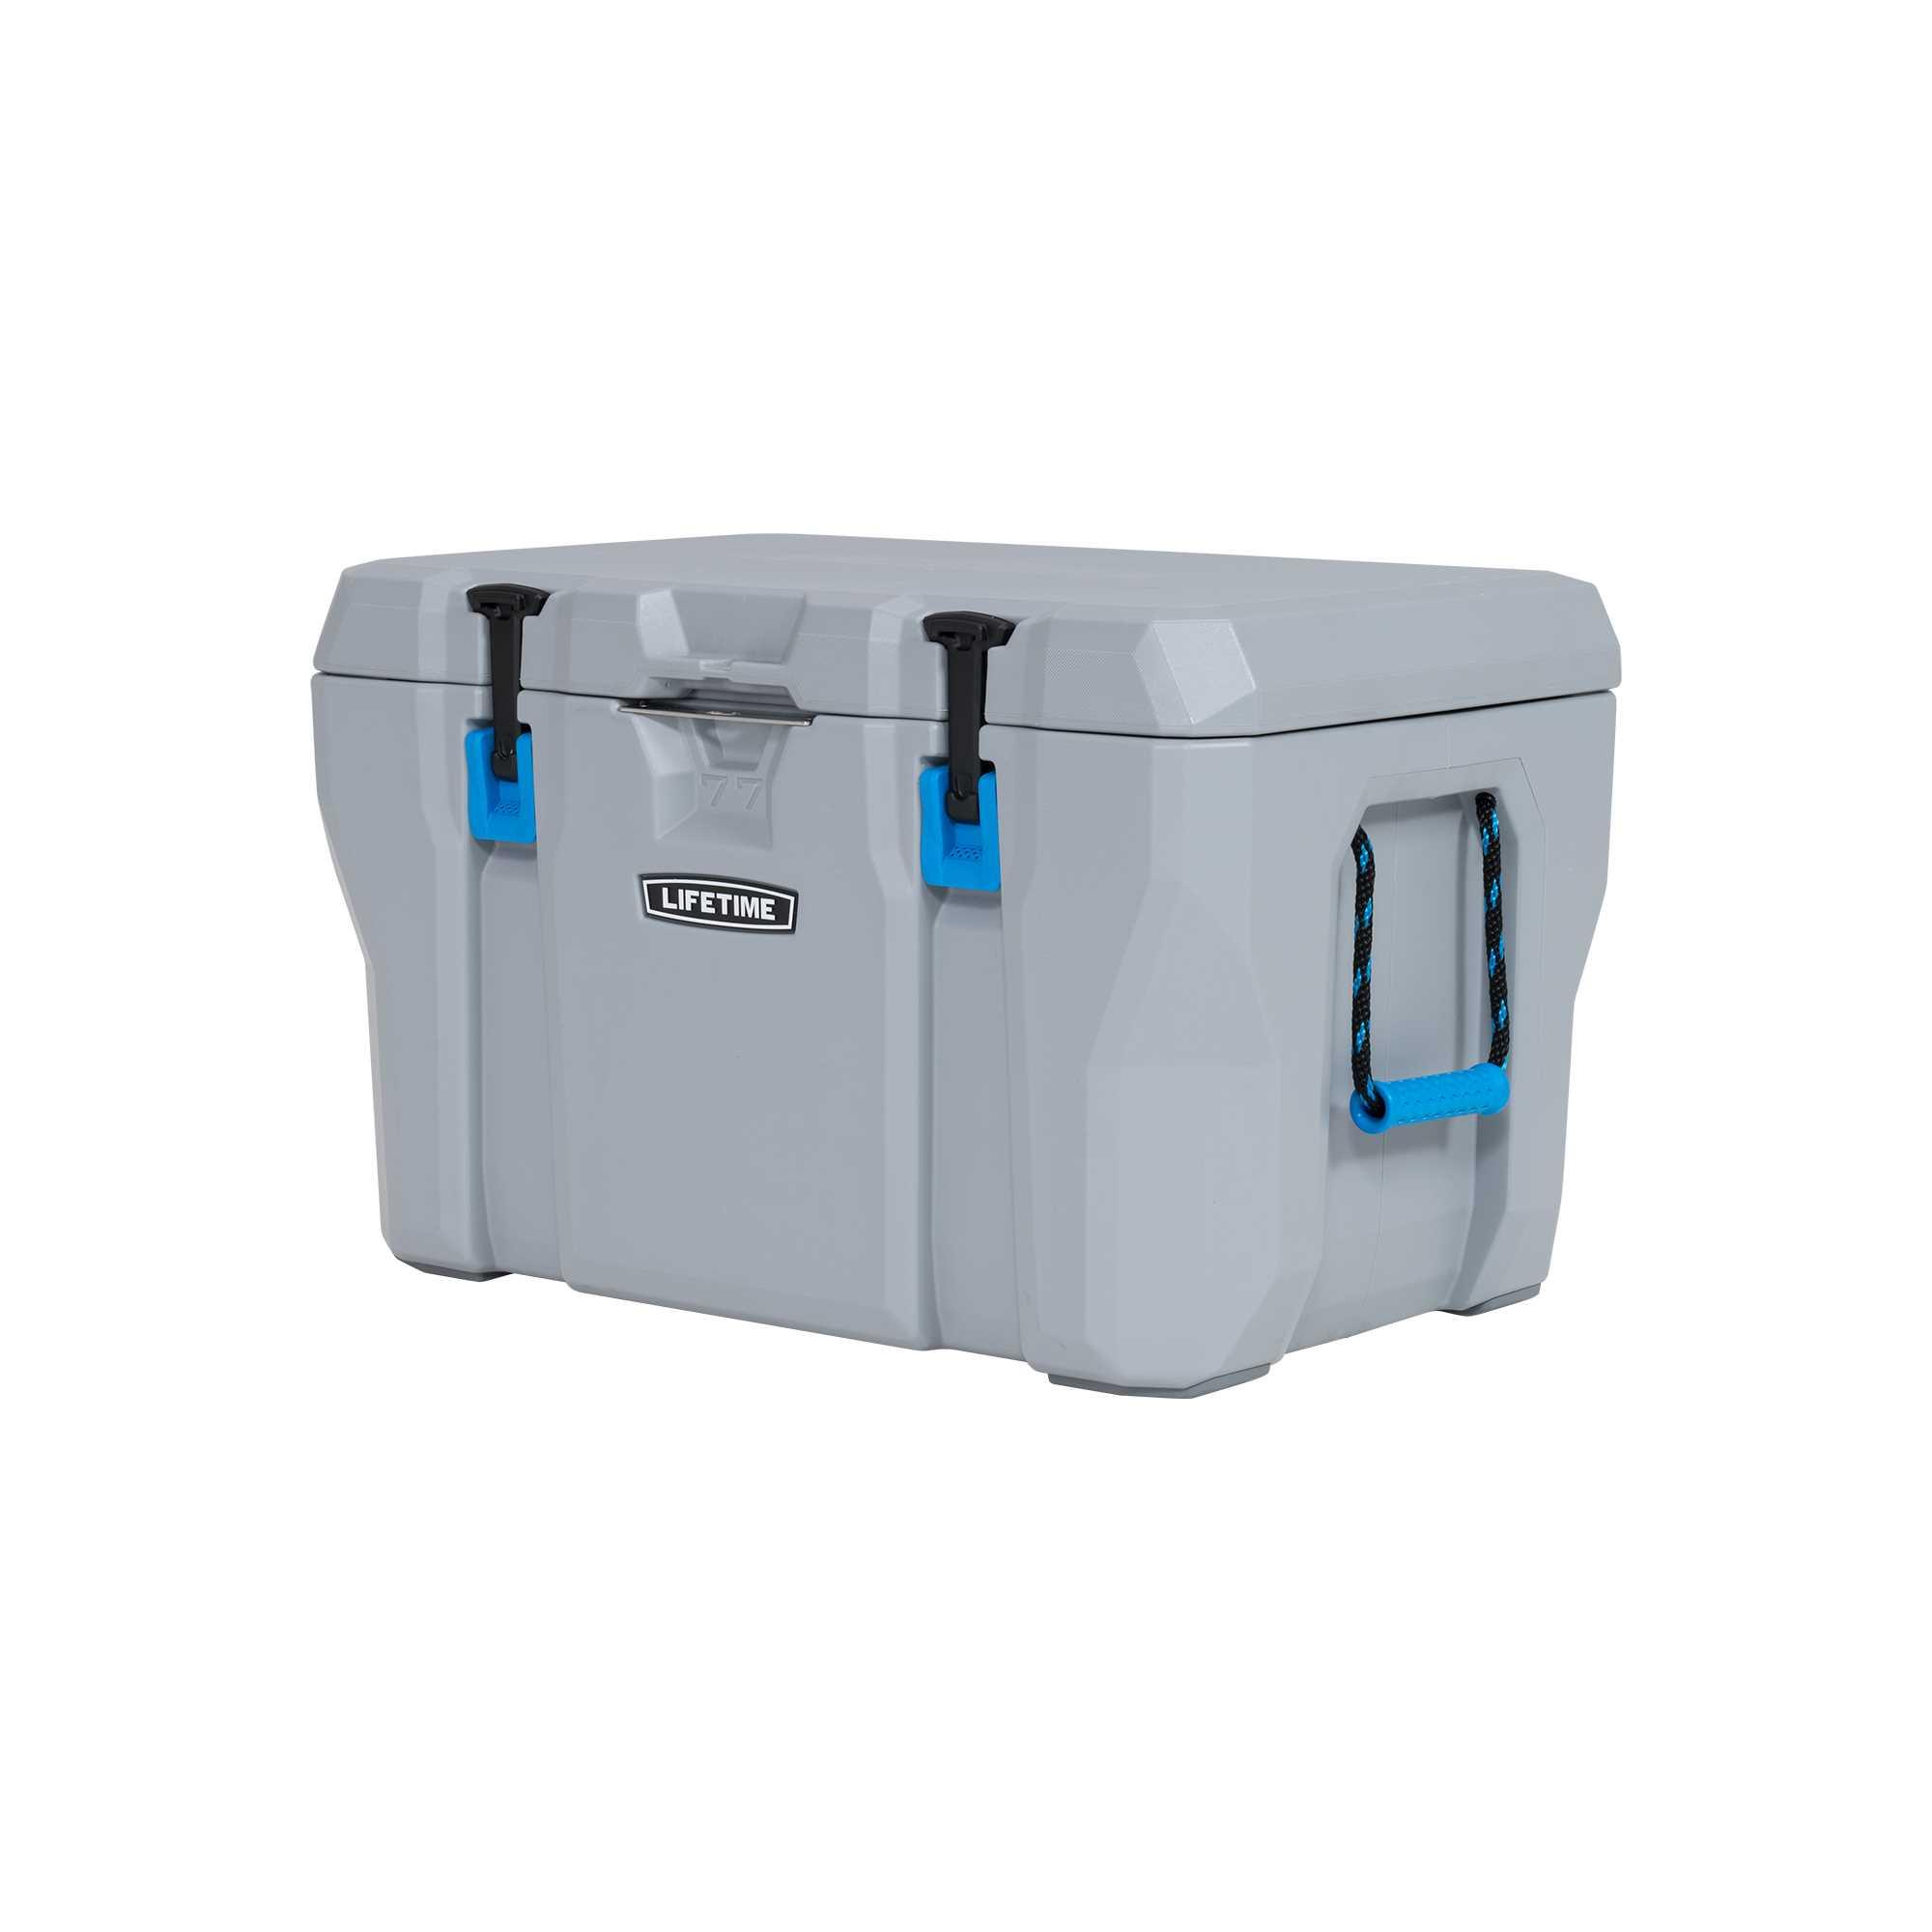 Lifetime 77QT Cooler $109 YMMV IN STORE WALMART